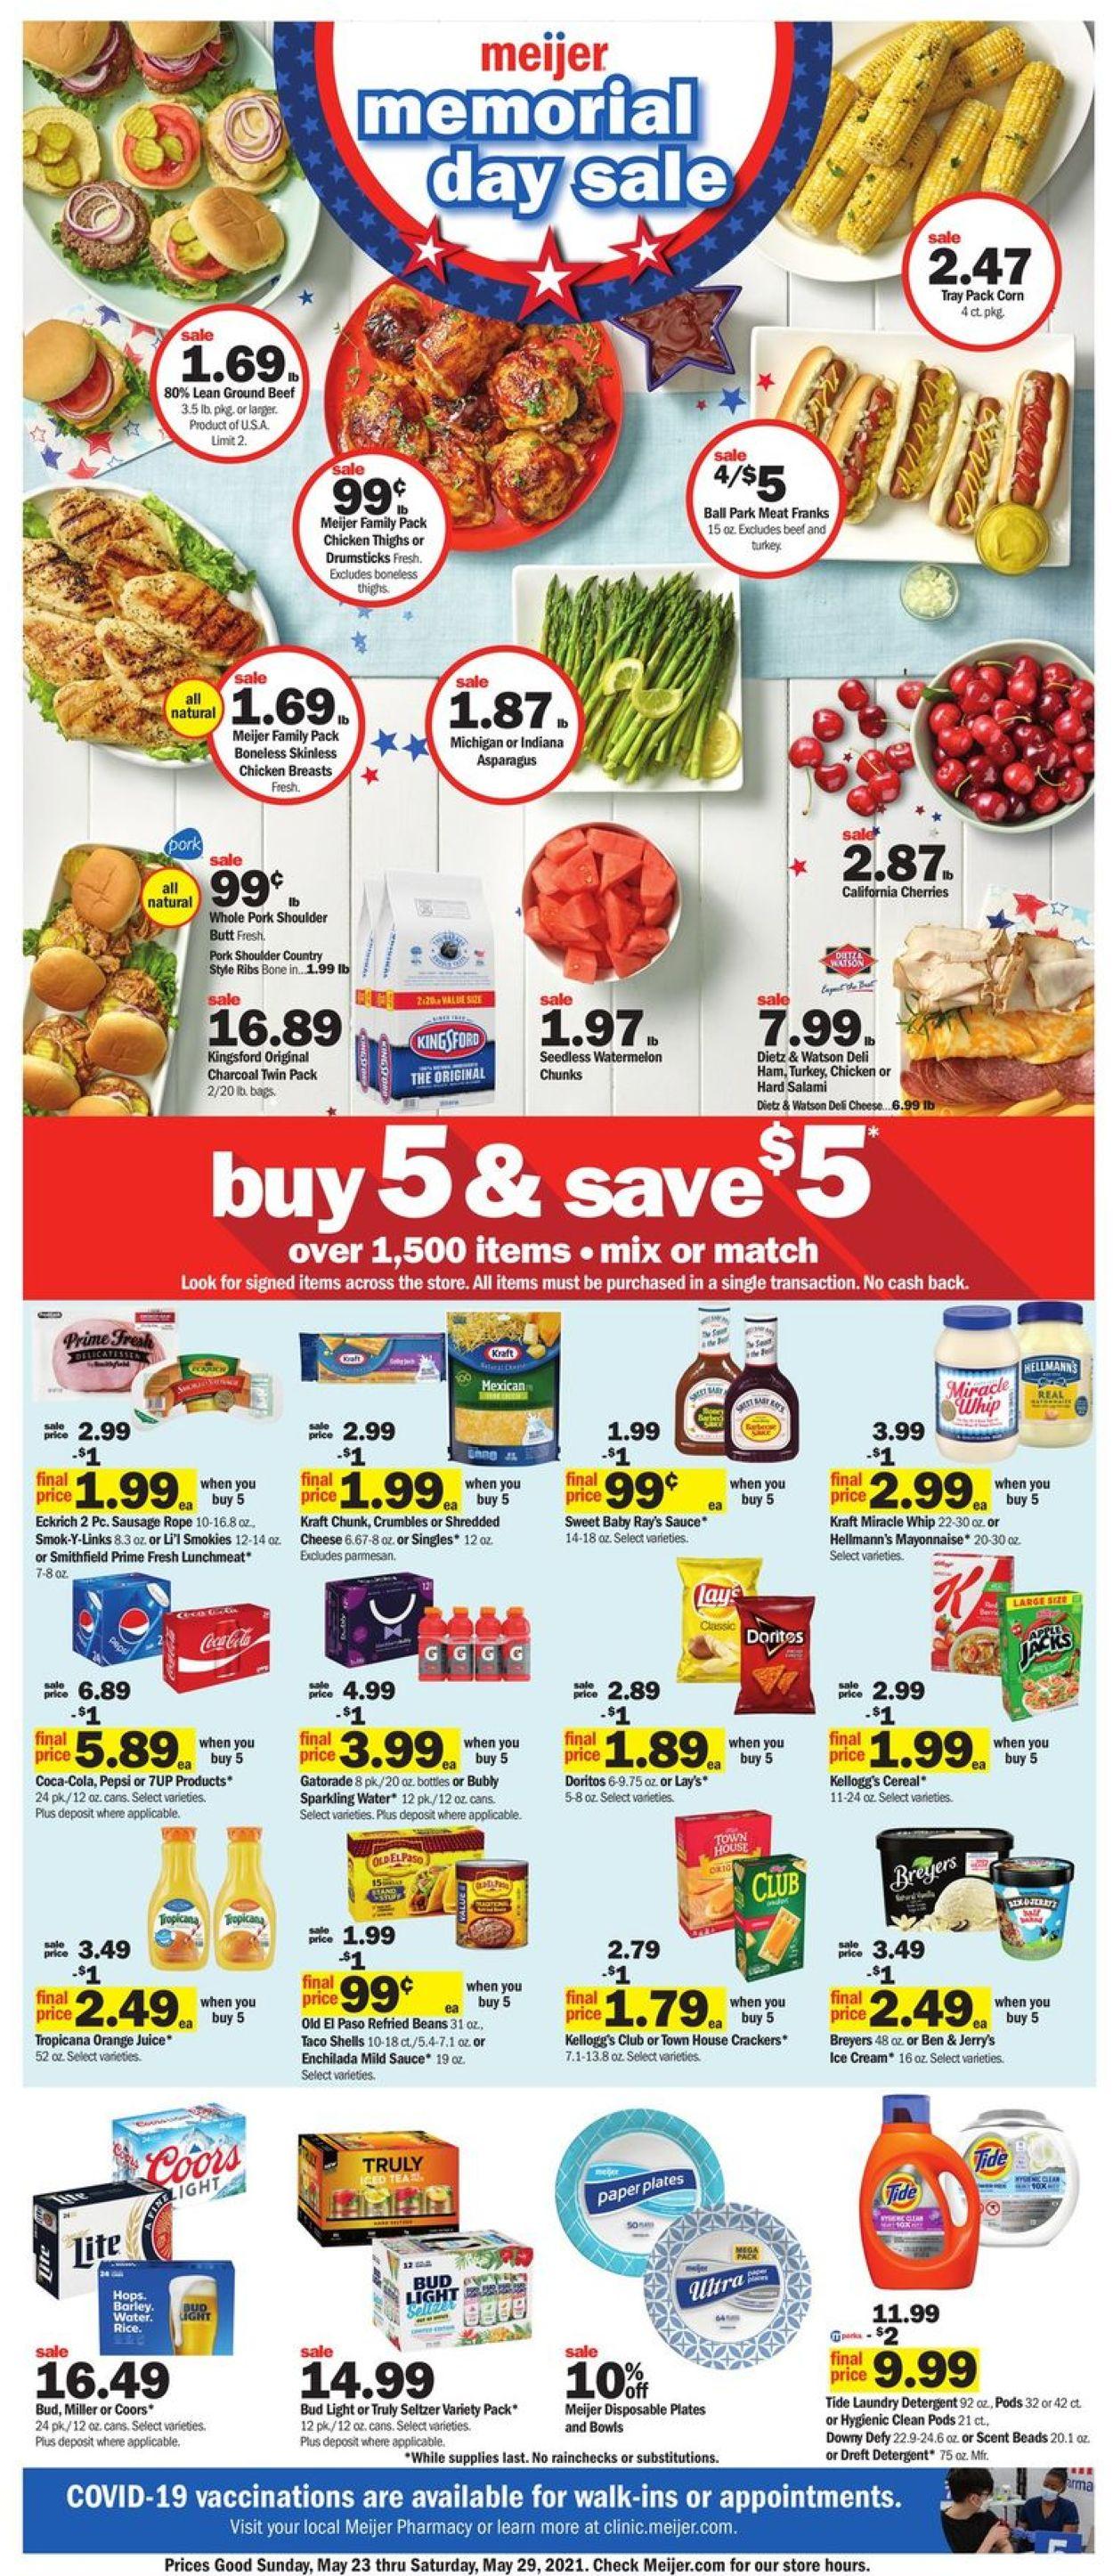 Meijer Weekly Ad Circular - valid 05/23-05/29/2021